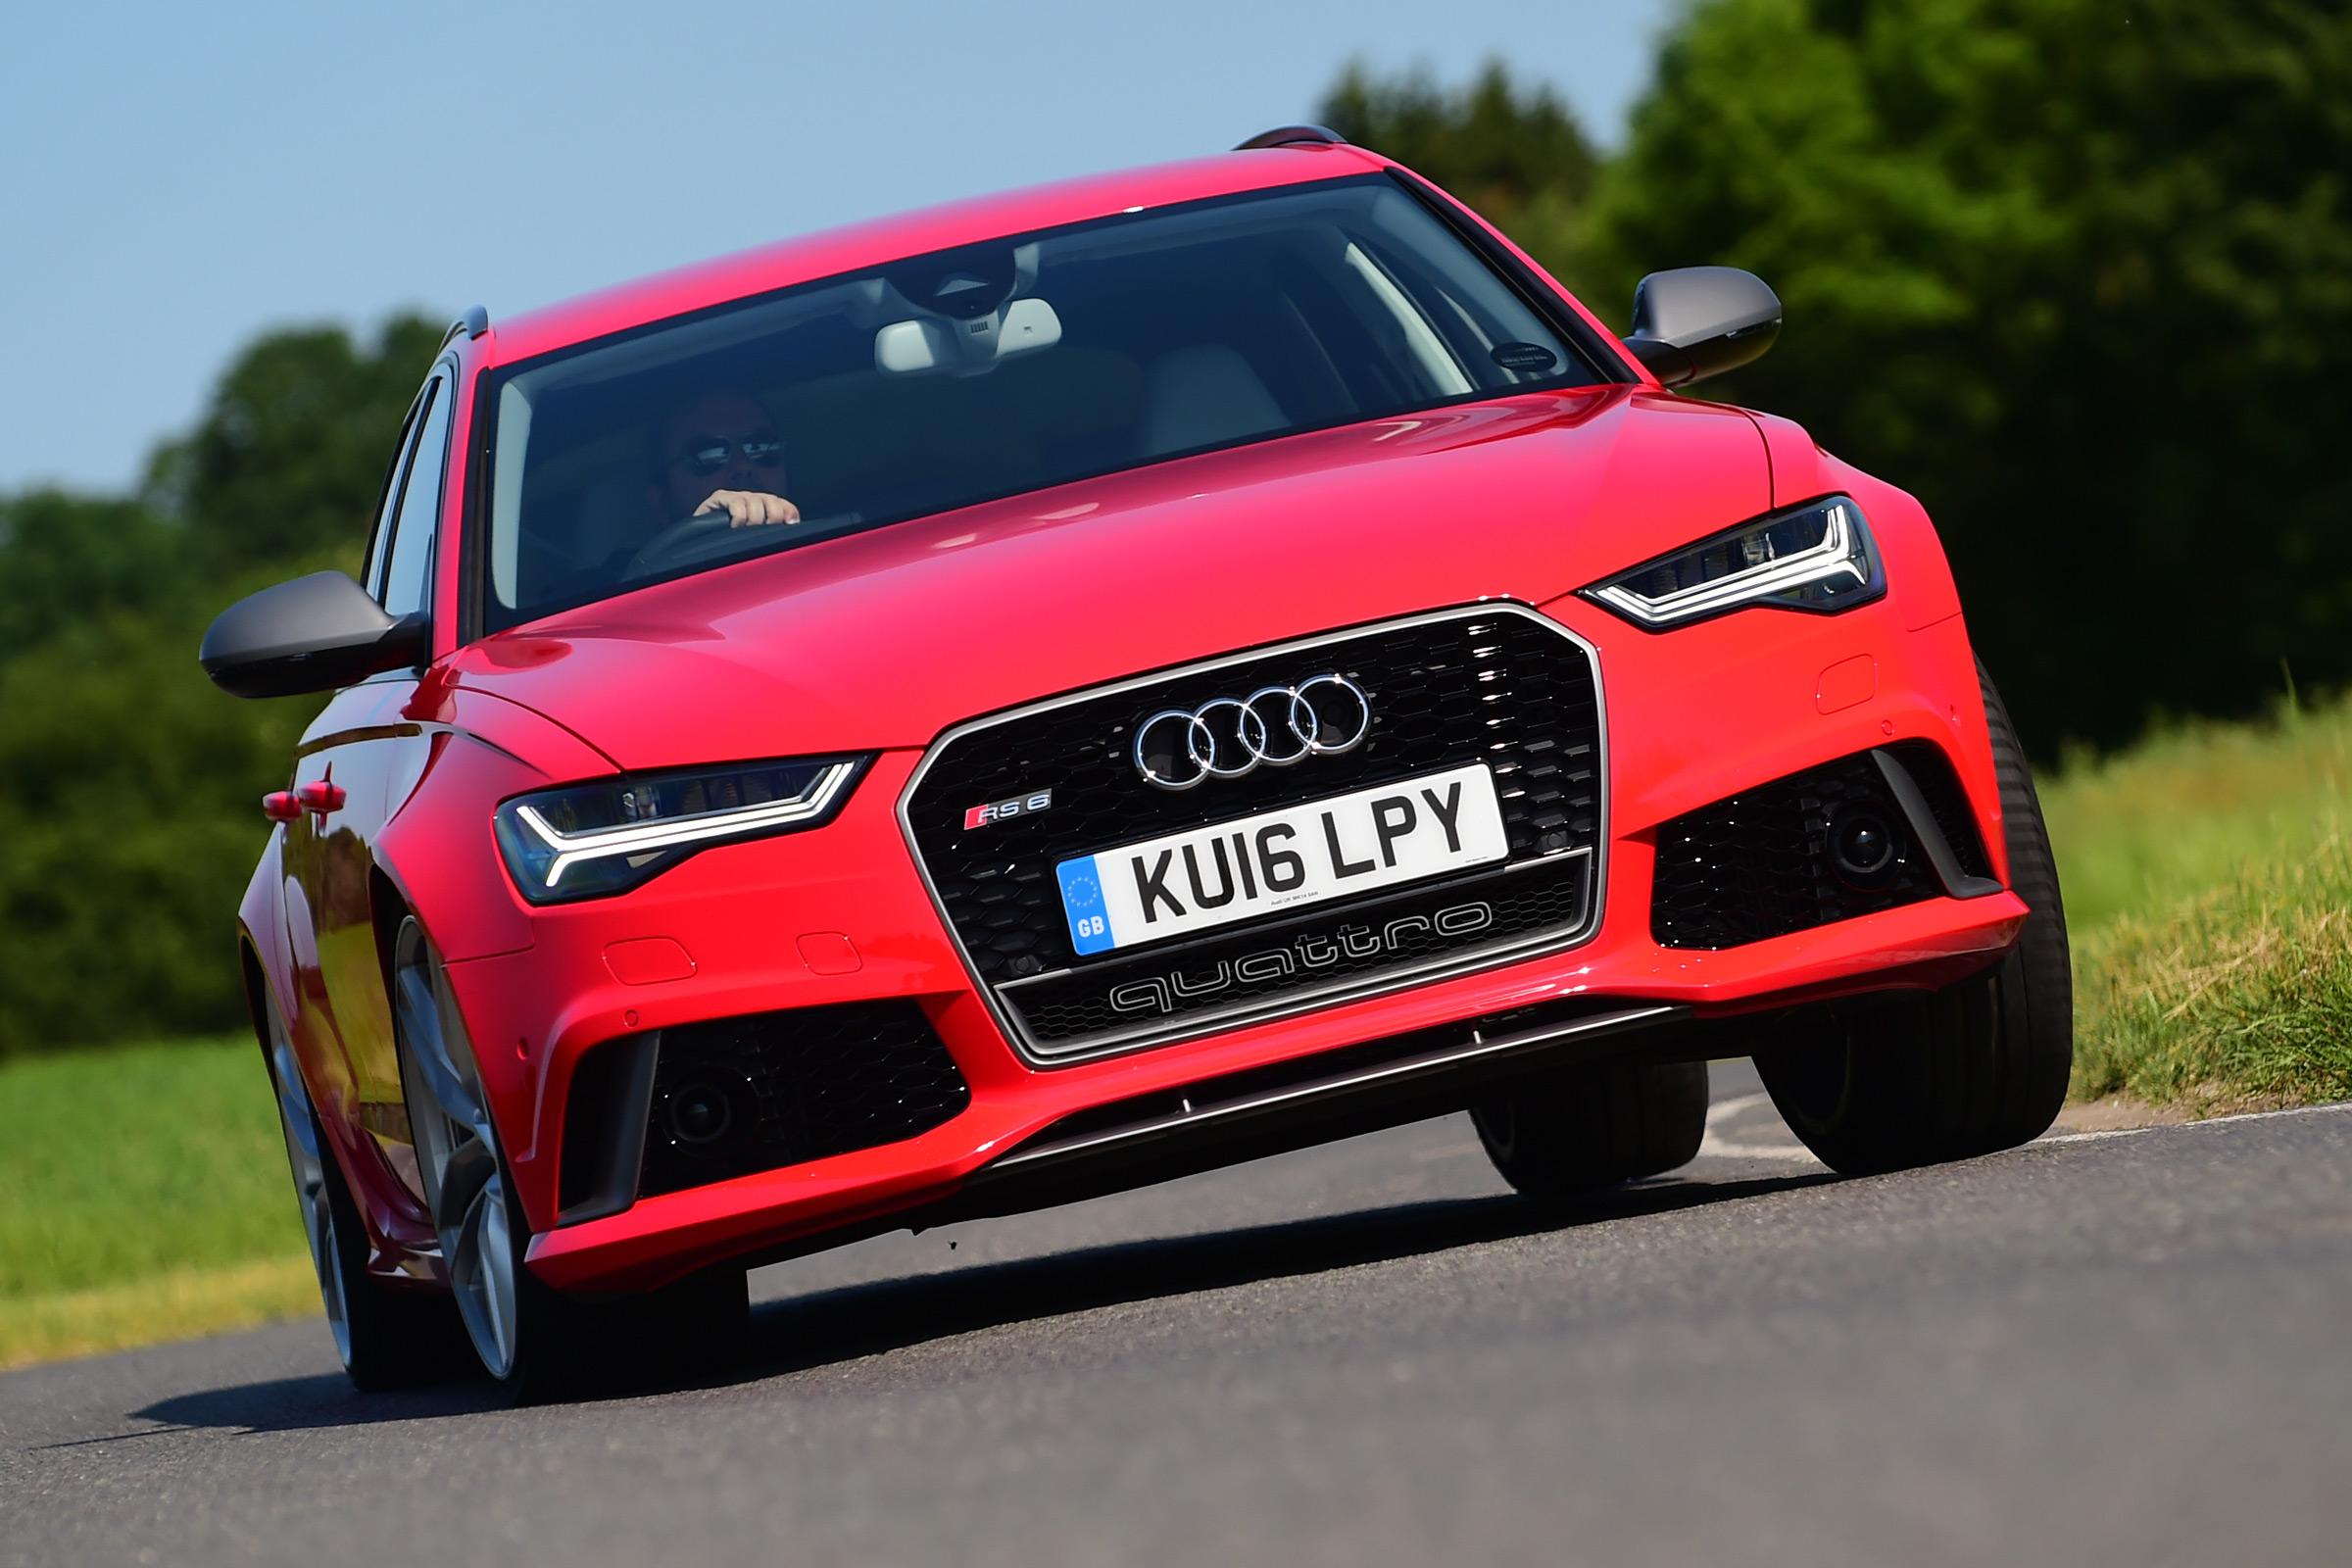 Kekurangan Audi Rs6 2016 Perbandingan Harga